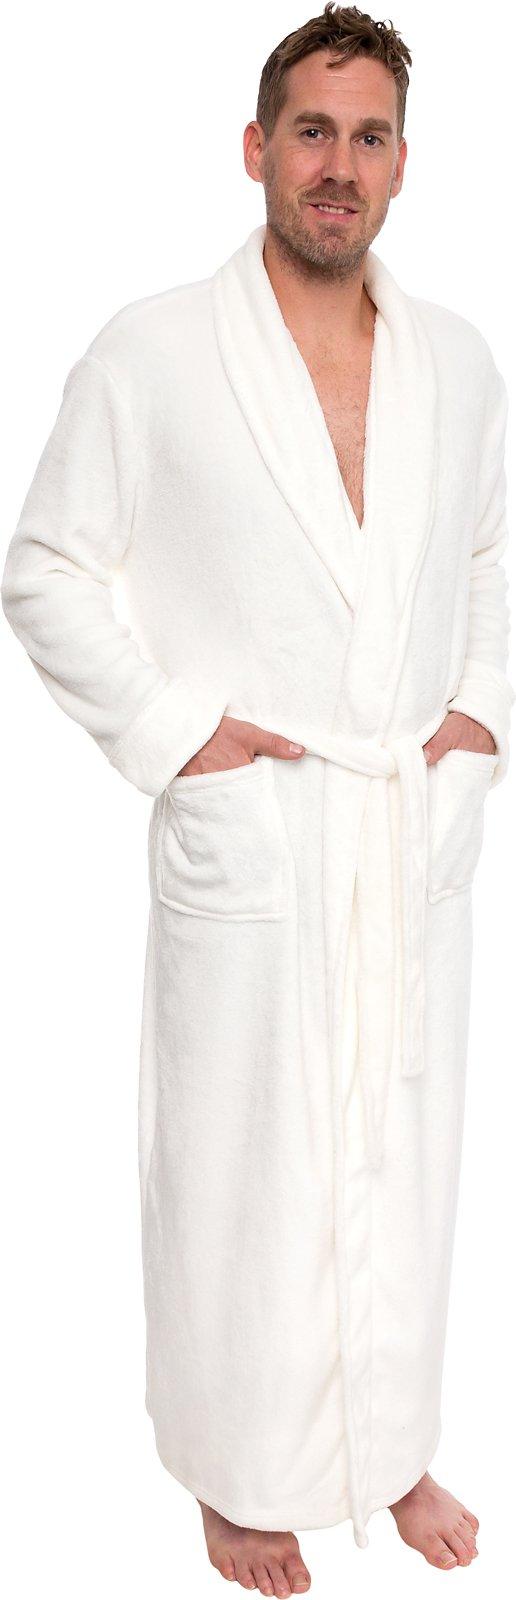 Ross Michaels Mens Long Robe - Full Length Big & Tall Bathrobe (White, L/XL)